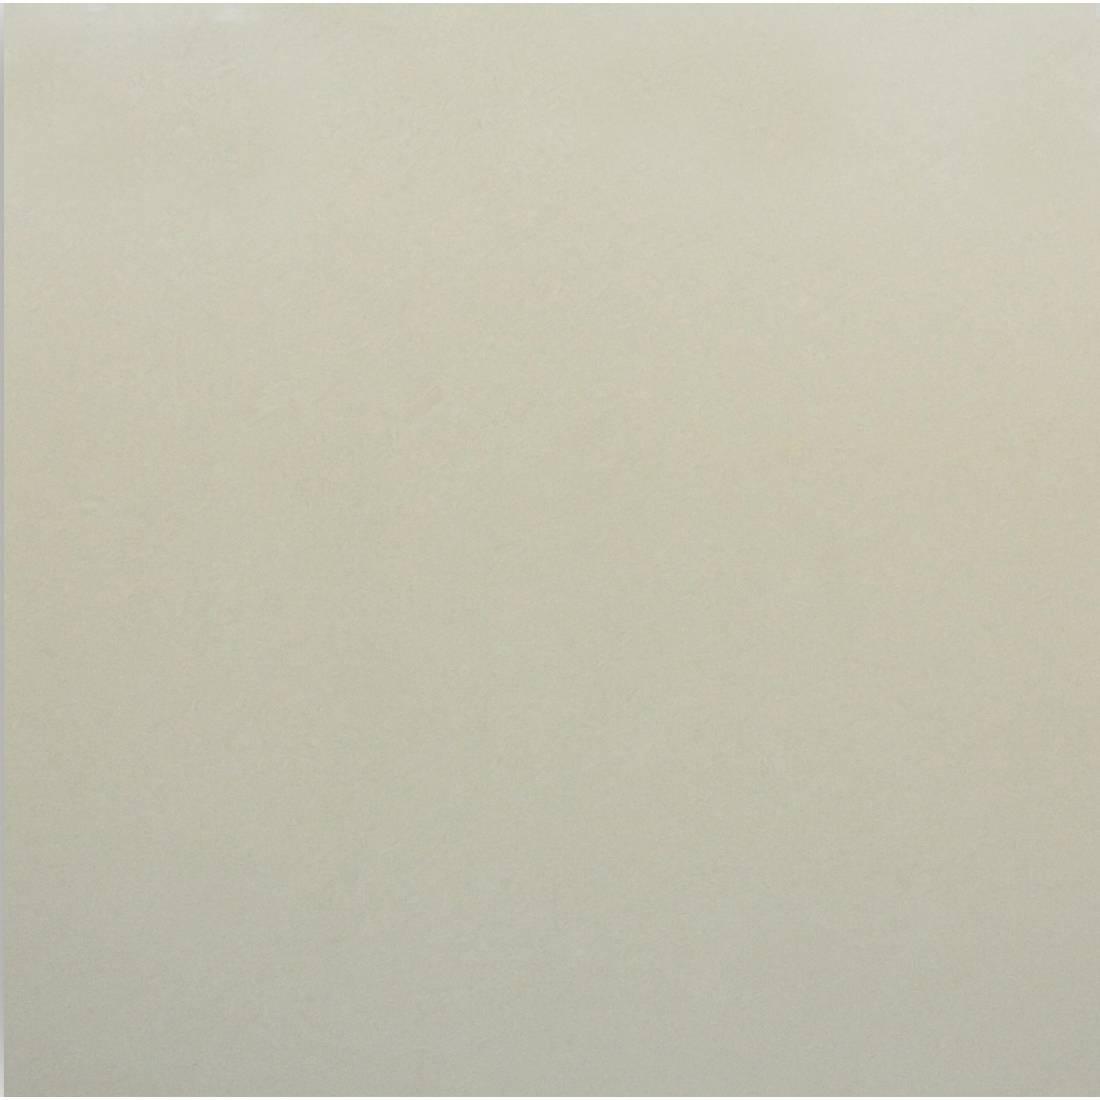 Tokyo 60x60 White Polished 1